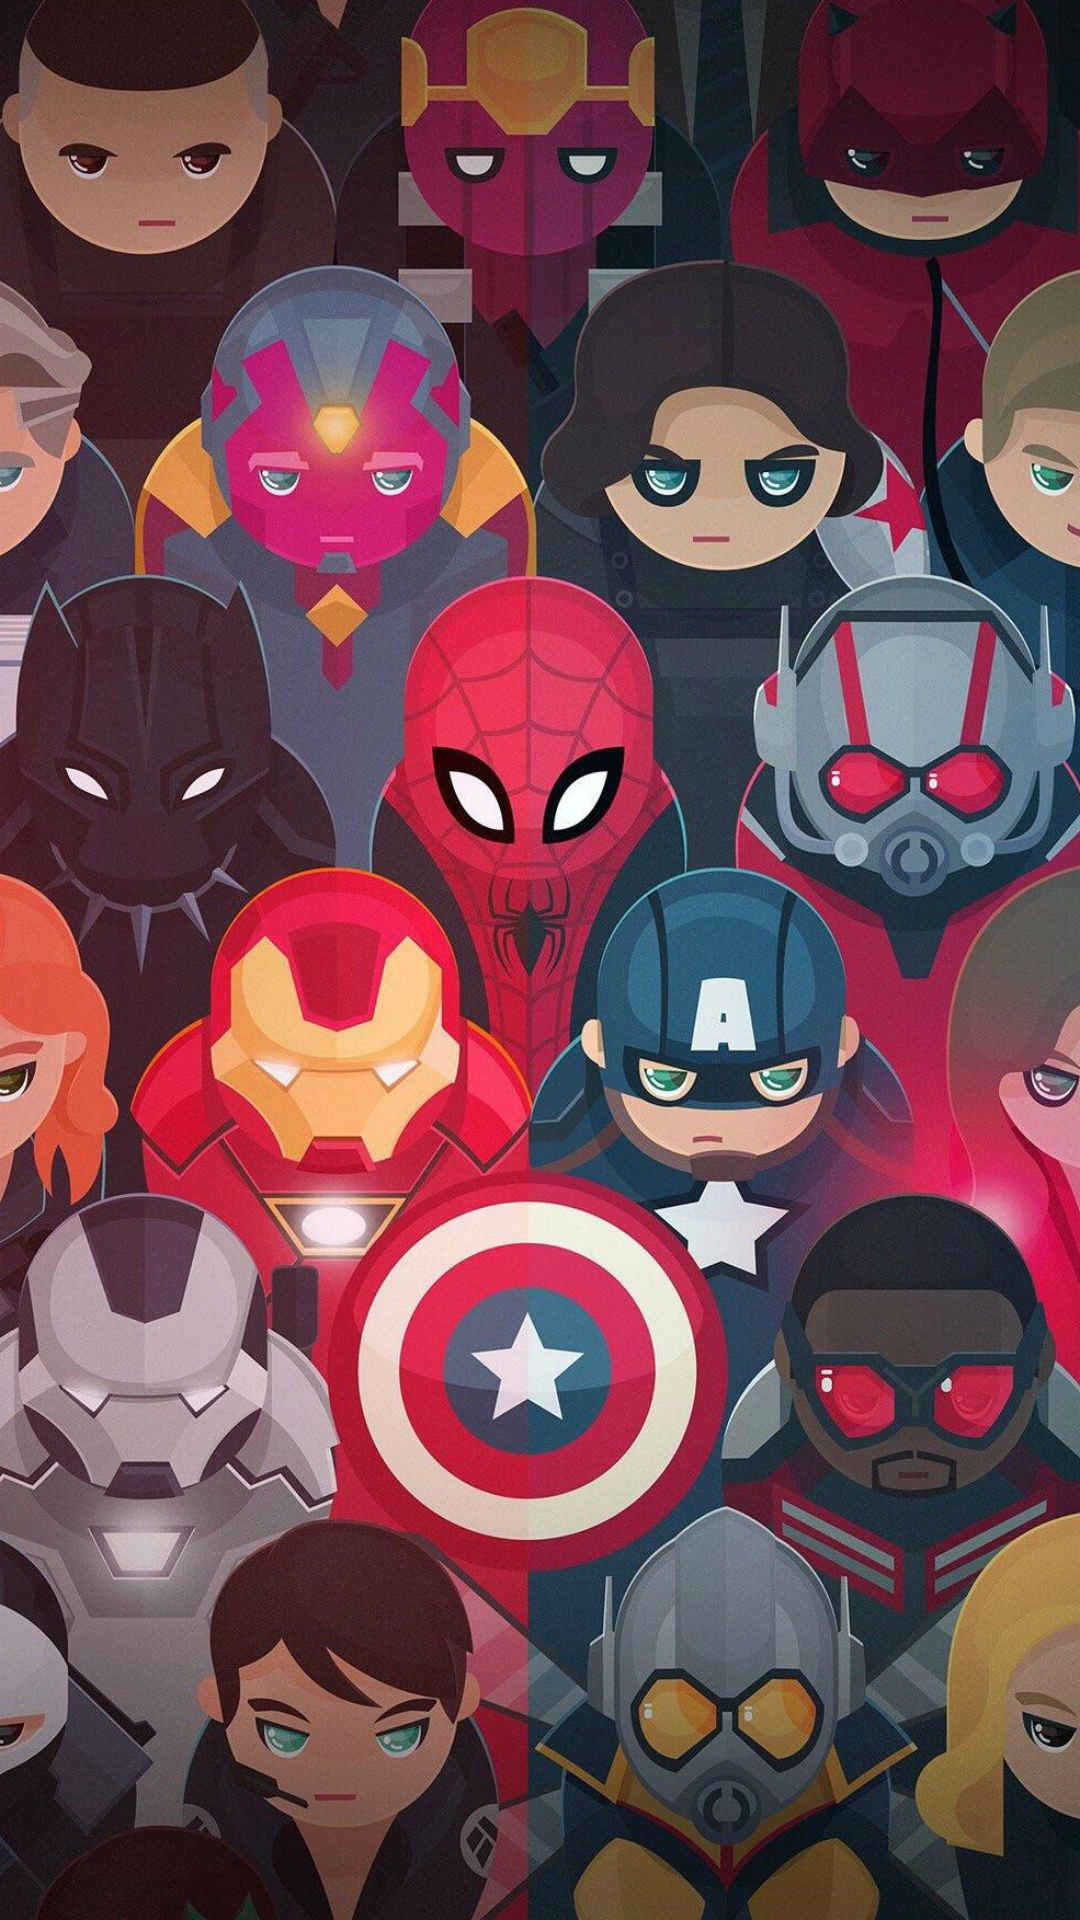 Avengers Apple Iphone 7 Plus Hd Fondos De Pantalla Disponible Para